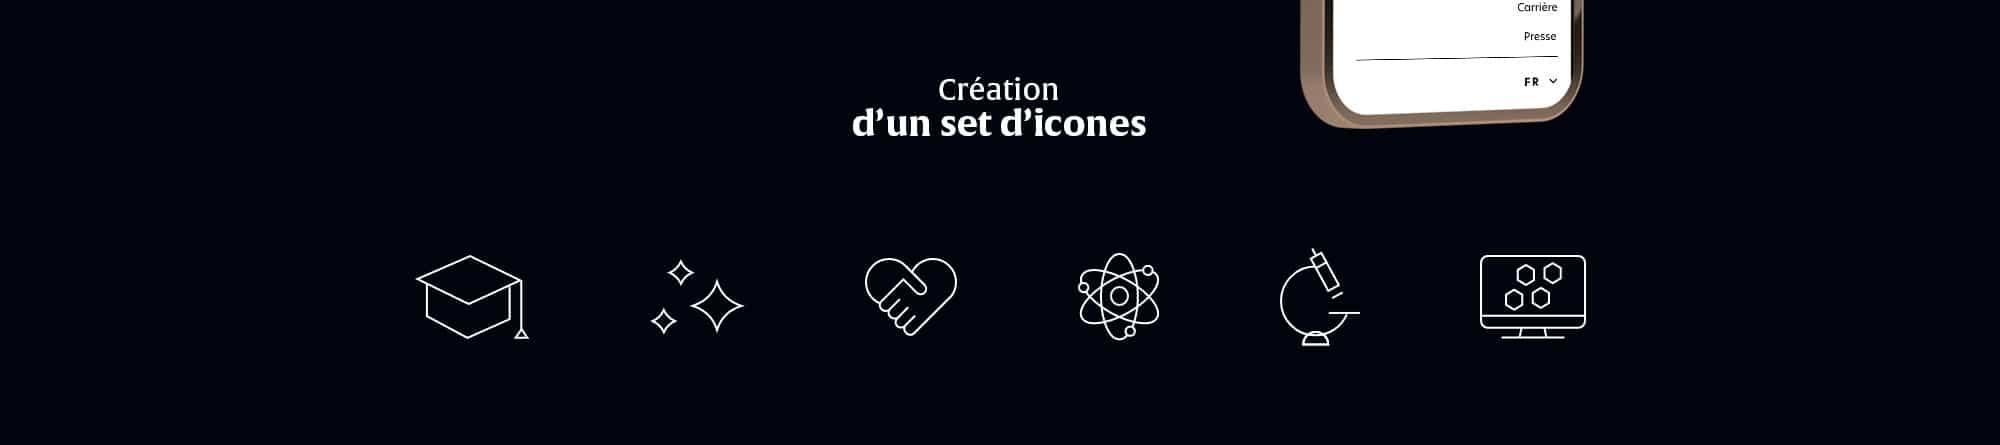 Création d'icones